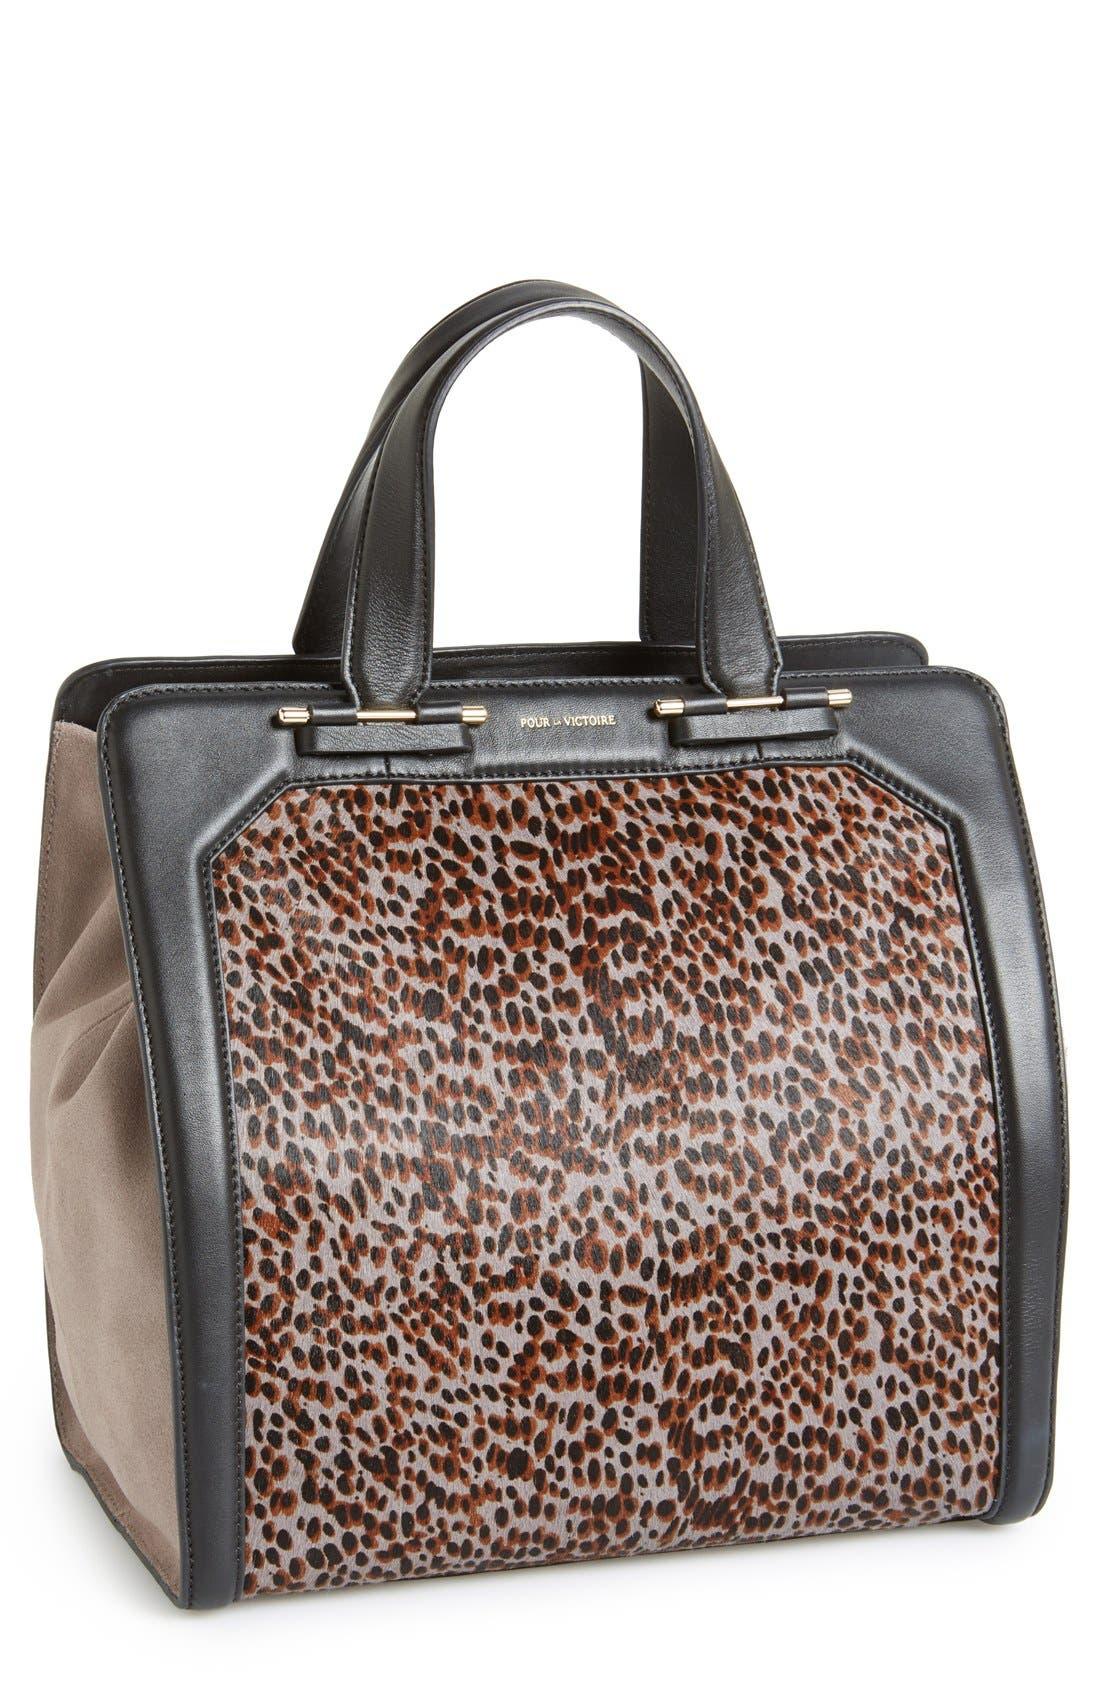 Main Image - Pour la Victoire 'Servant' Leather & Genuine Calf Hair Tote